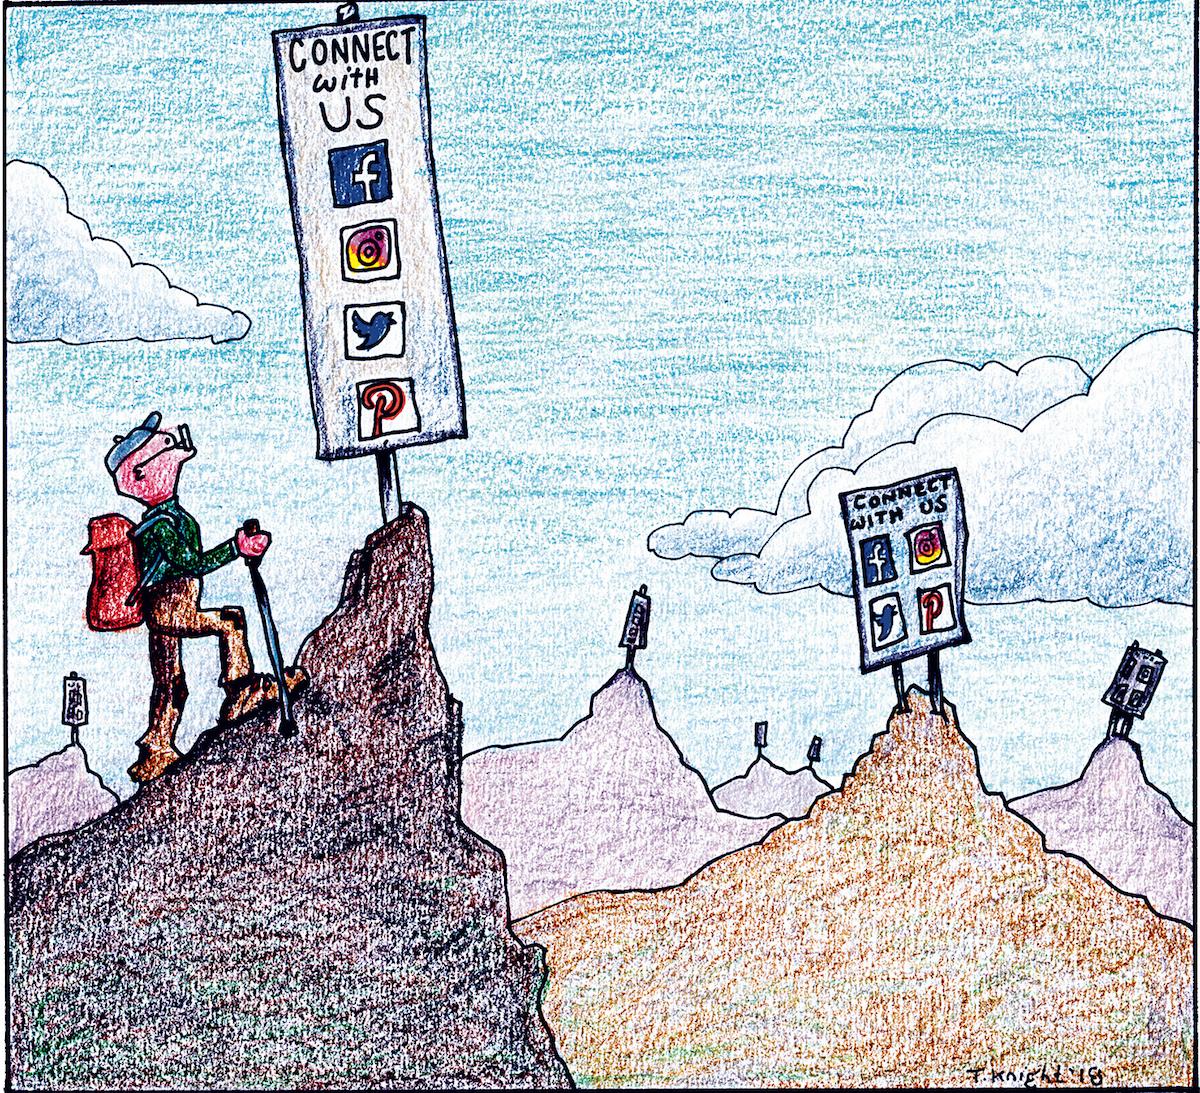 [Cartoon] Tami Knight